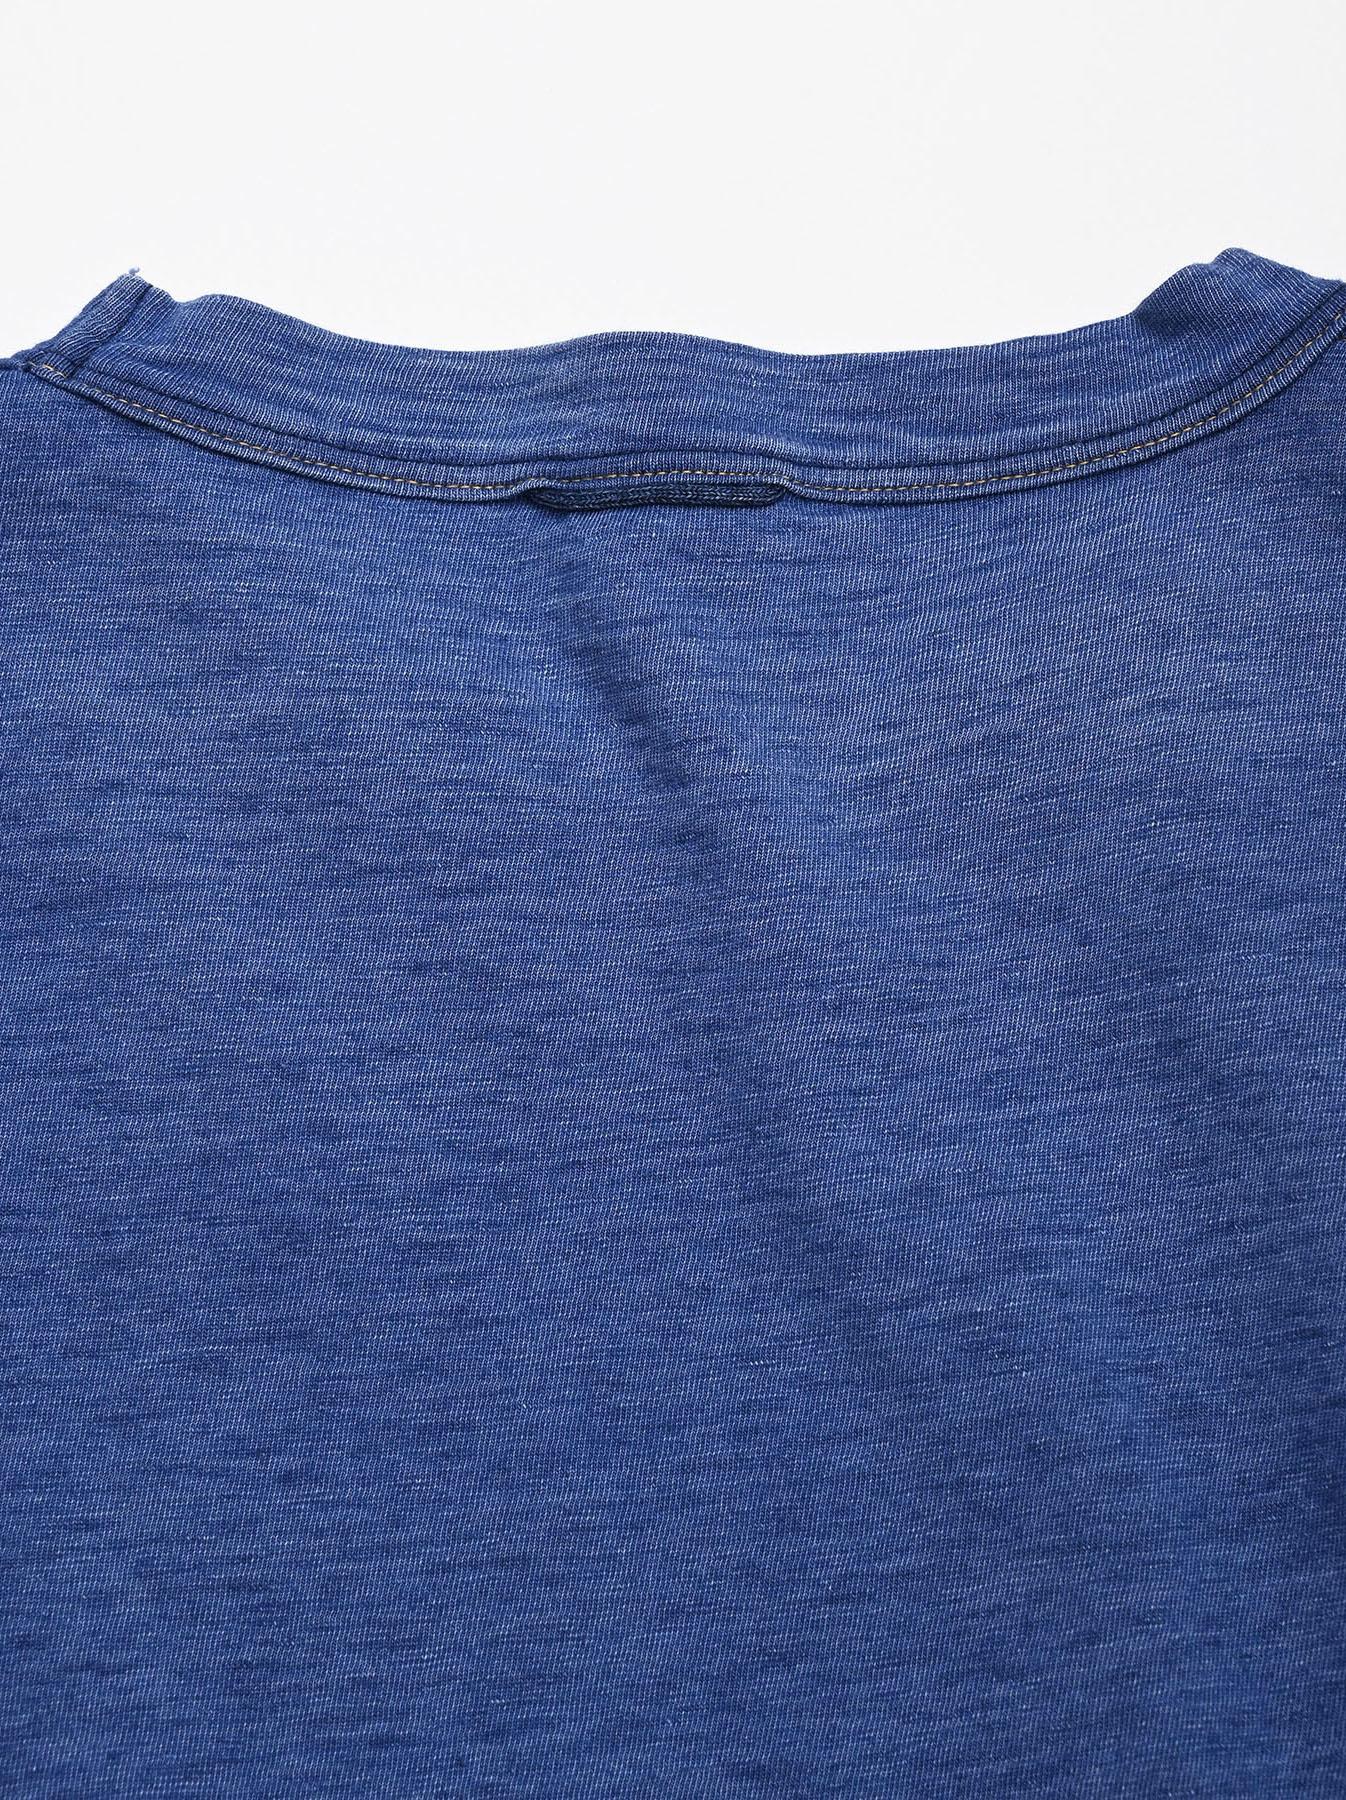 Distressed Indigo Tenjiku 908 Ocean T-Shirt (0621)-10